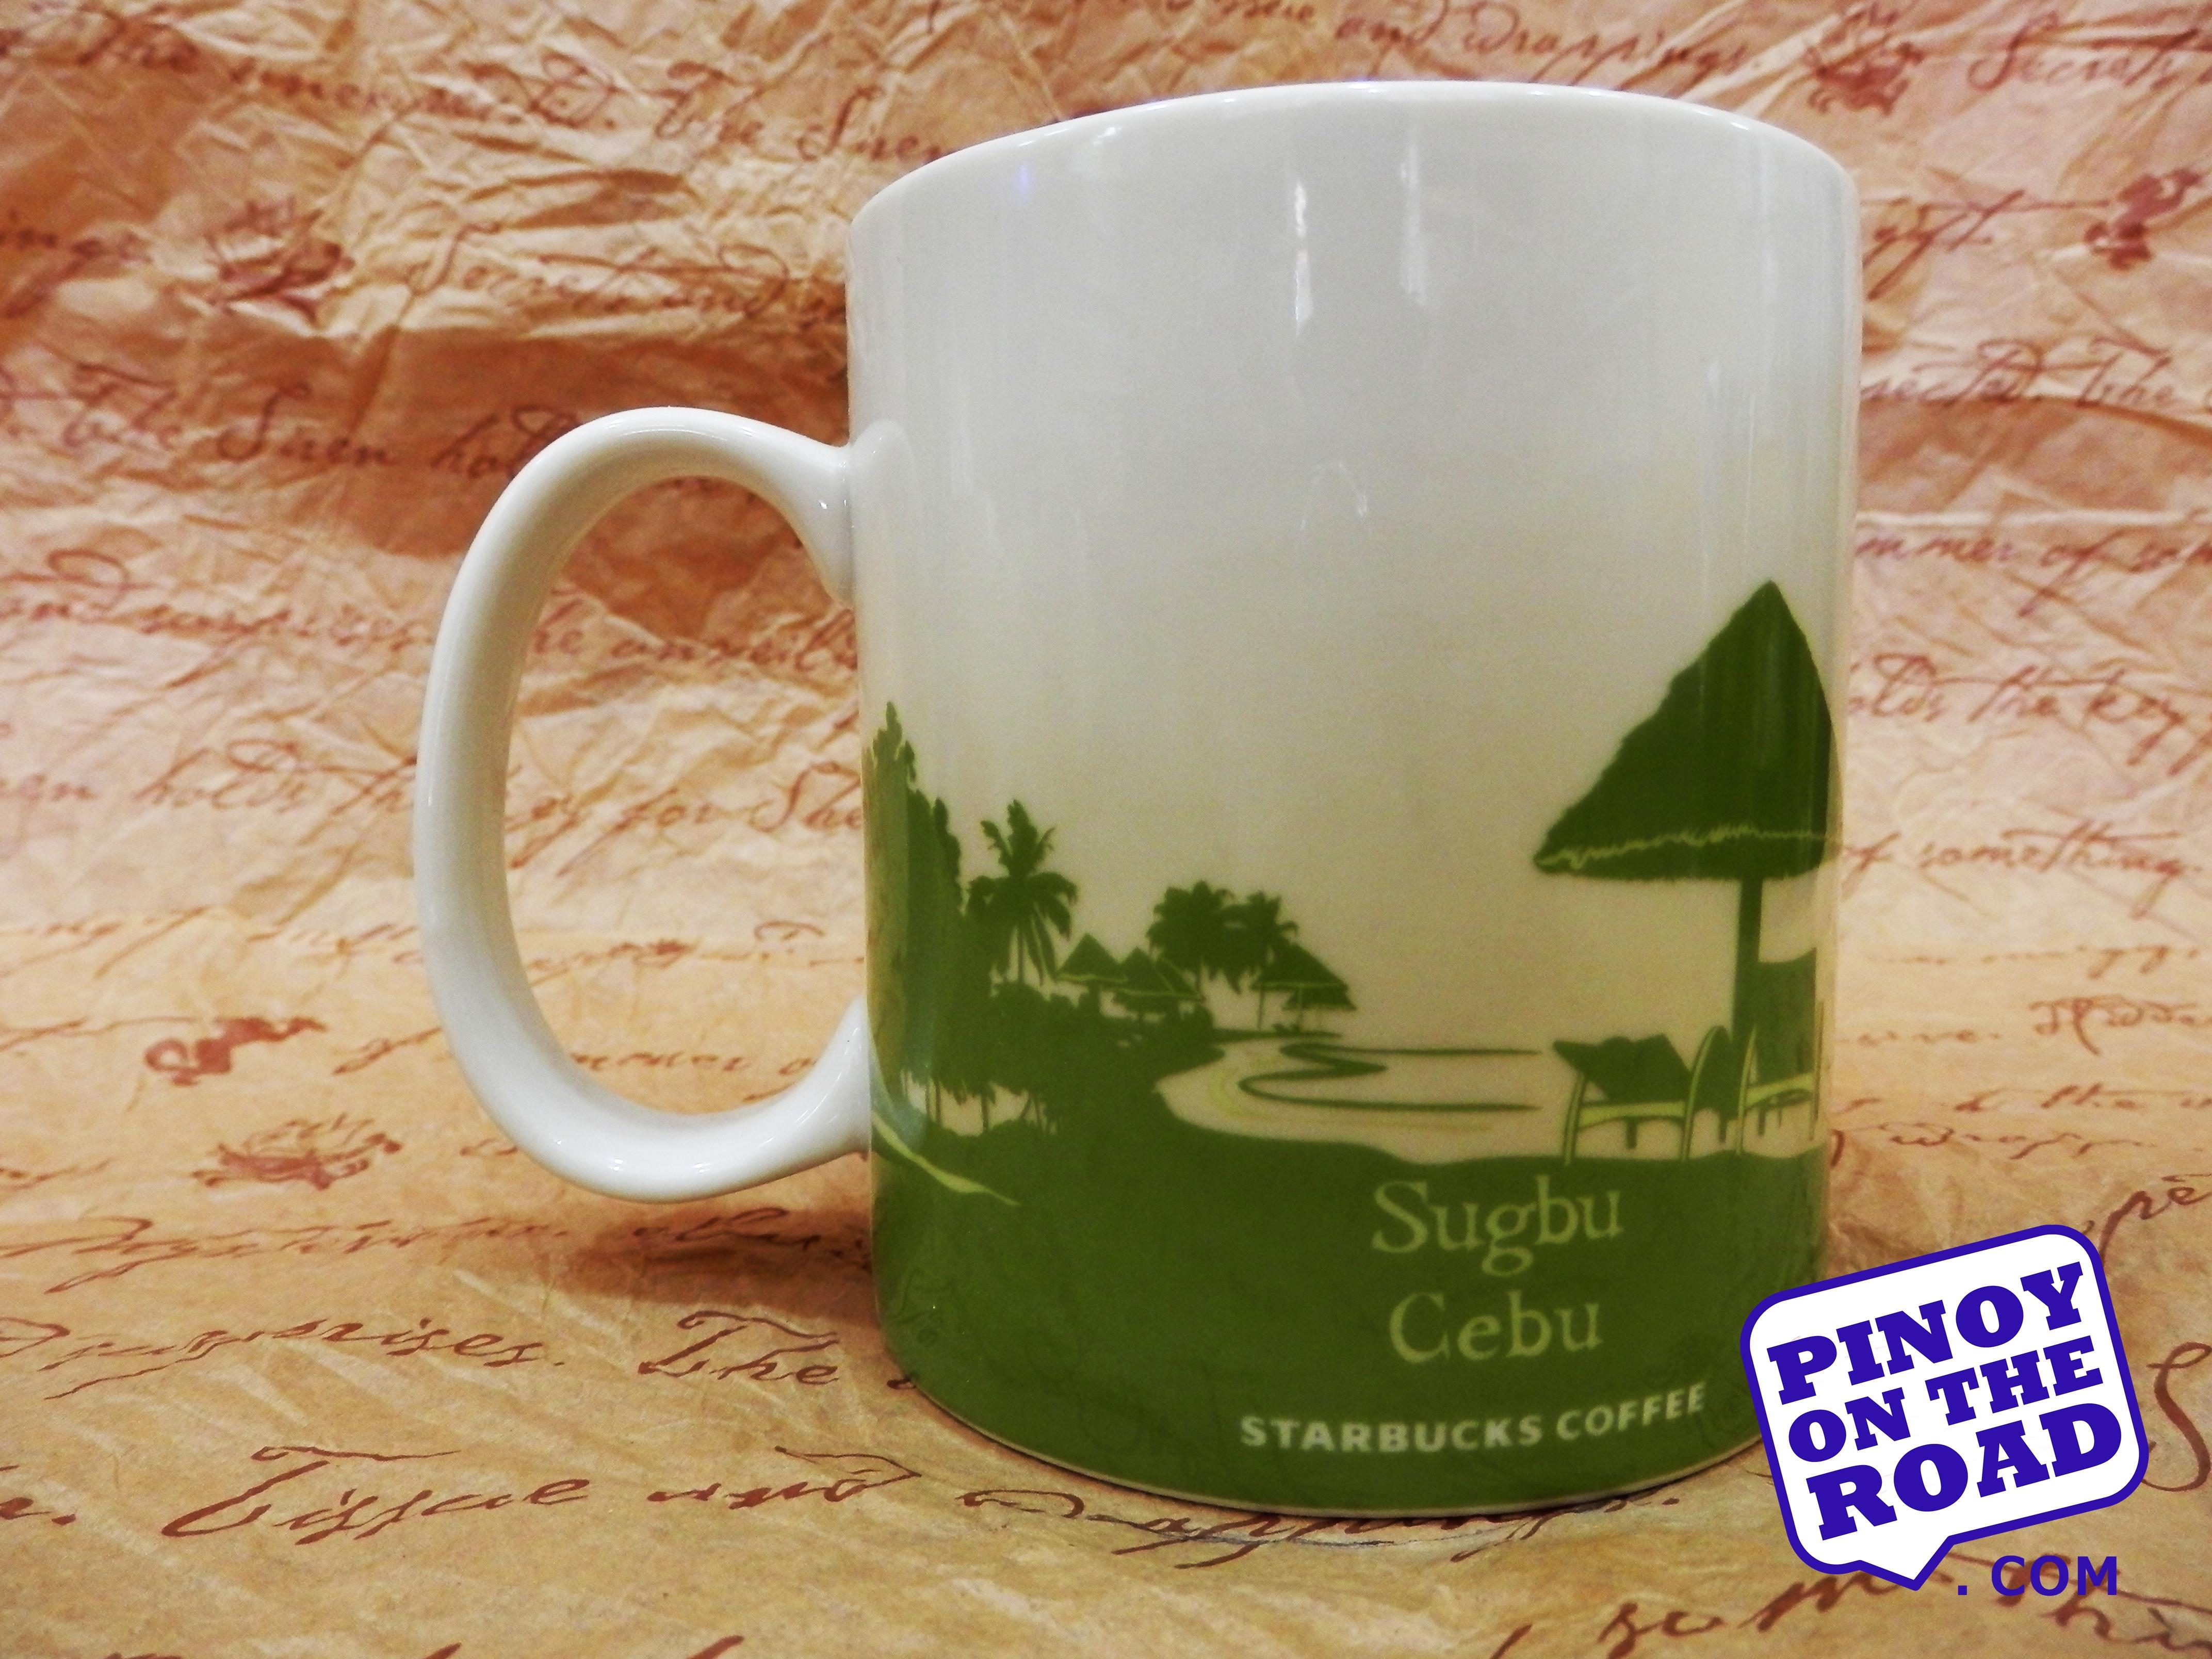 starbucks cebu icon mug starbucks icon mugs. Black Bedroom Furniture Sets. Home Design Ideas